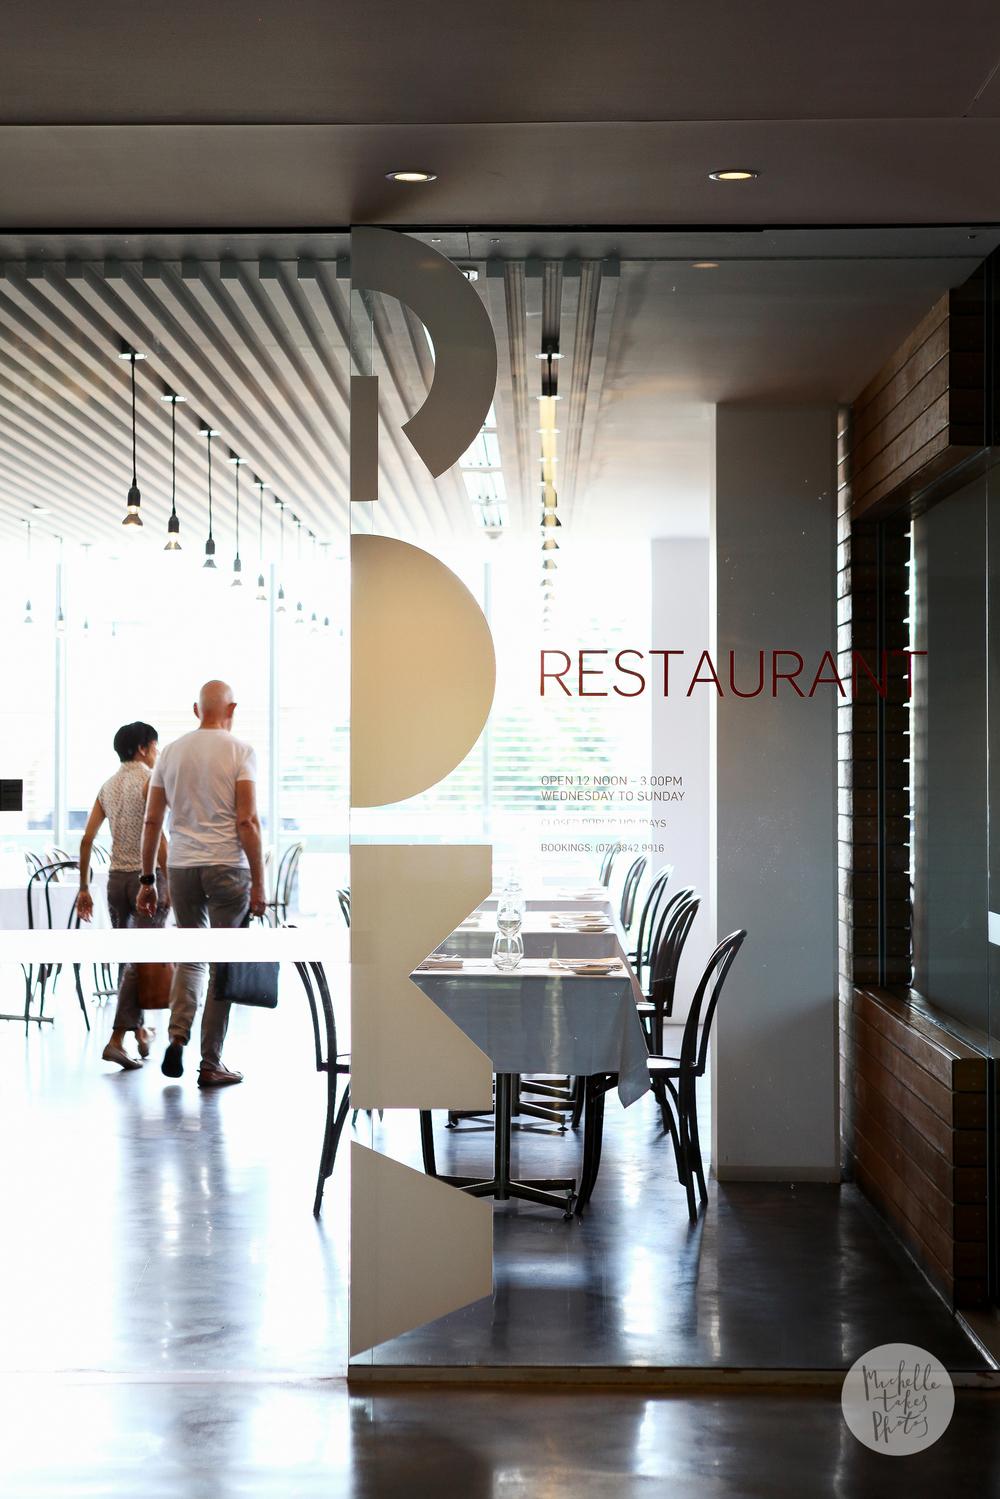 GOMA Restaurant at the Queensland Gallery of Modern Art, South Brisbane.